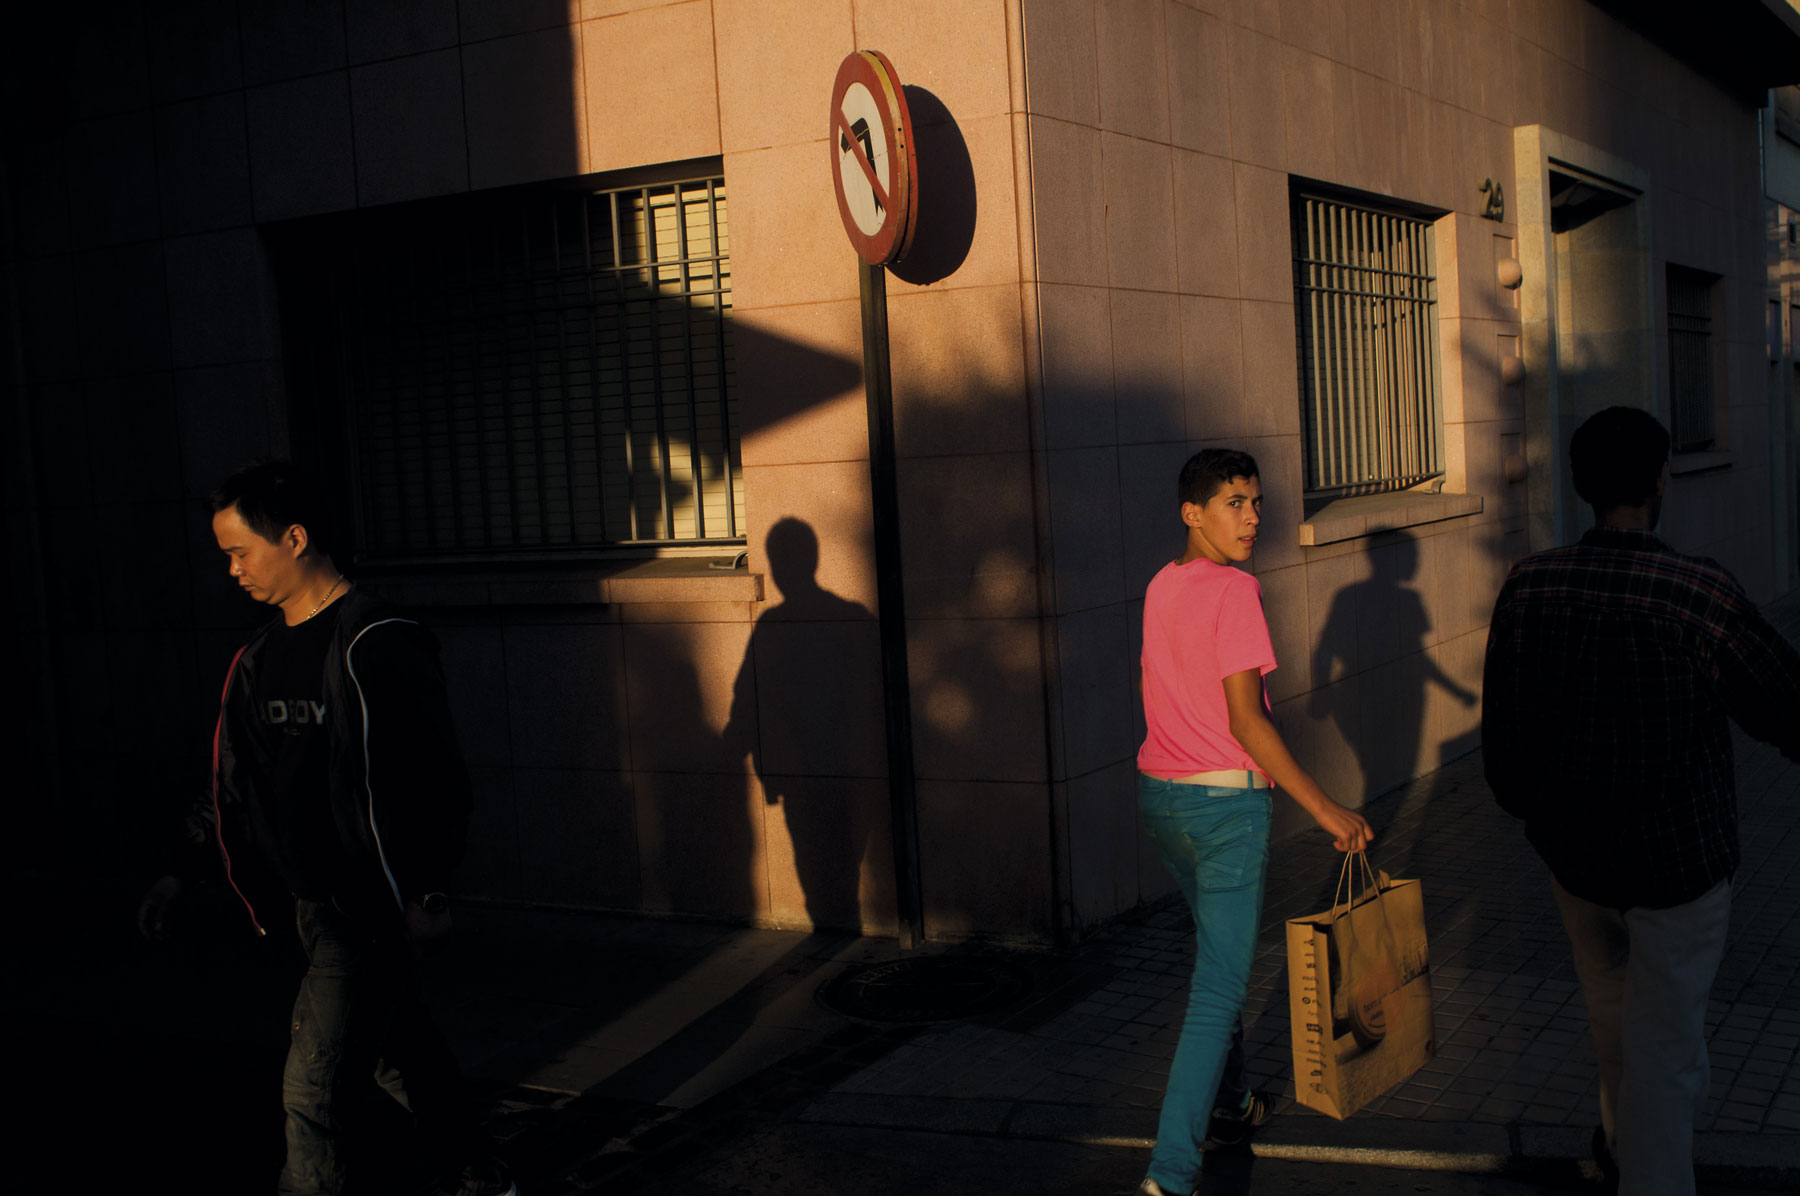 Figueres, 2014 - TIENDA - MARCELO CABALLERO